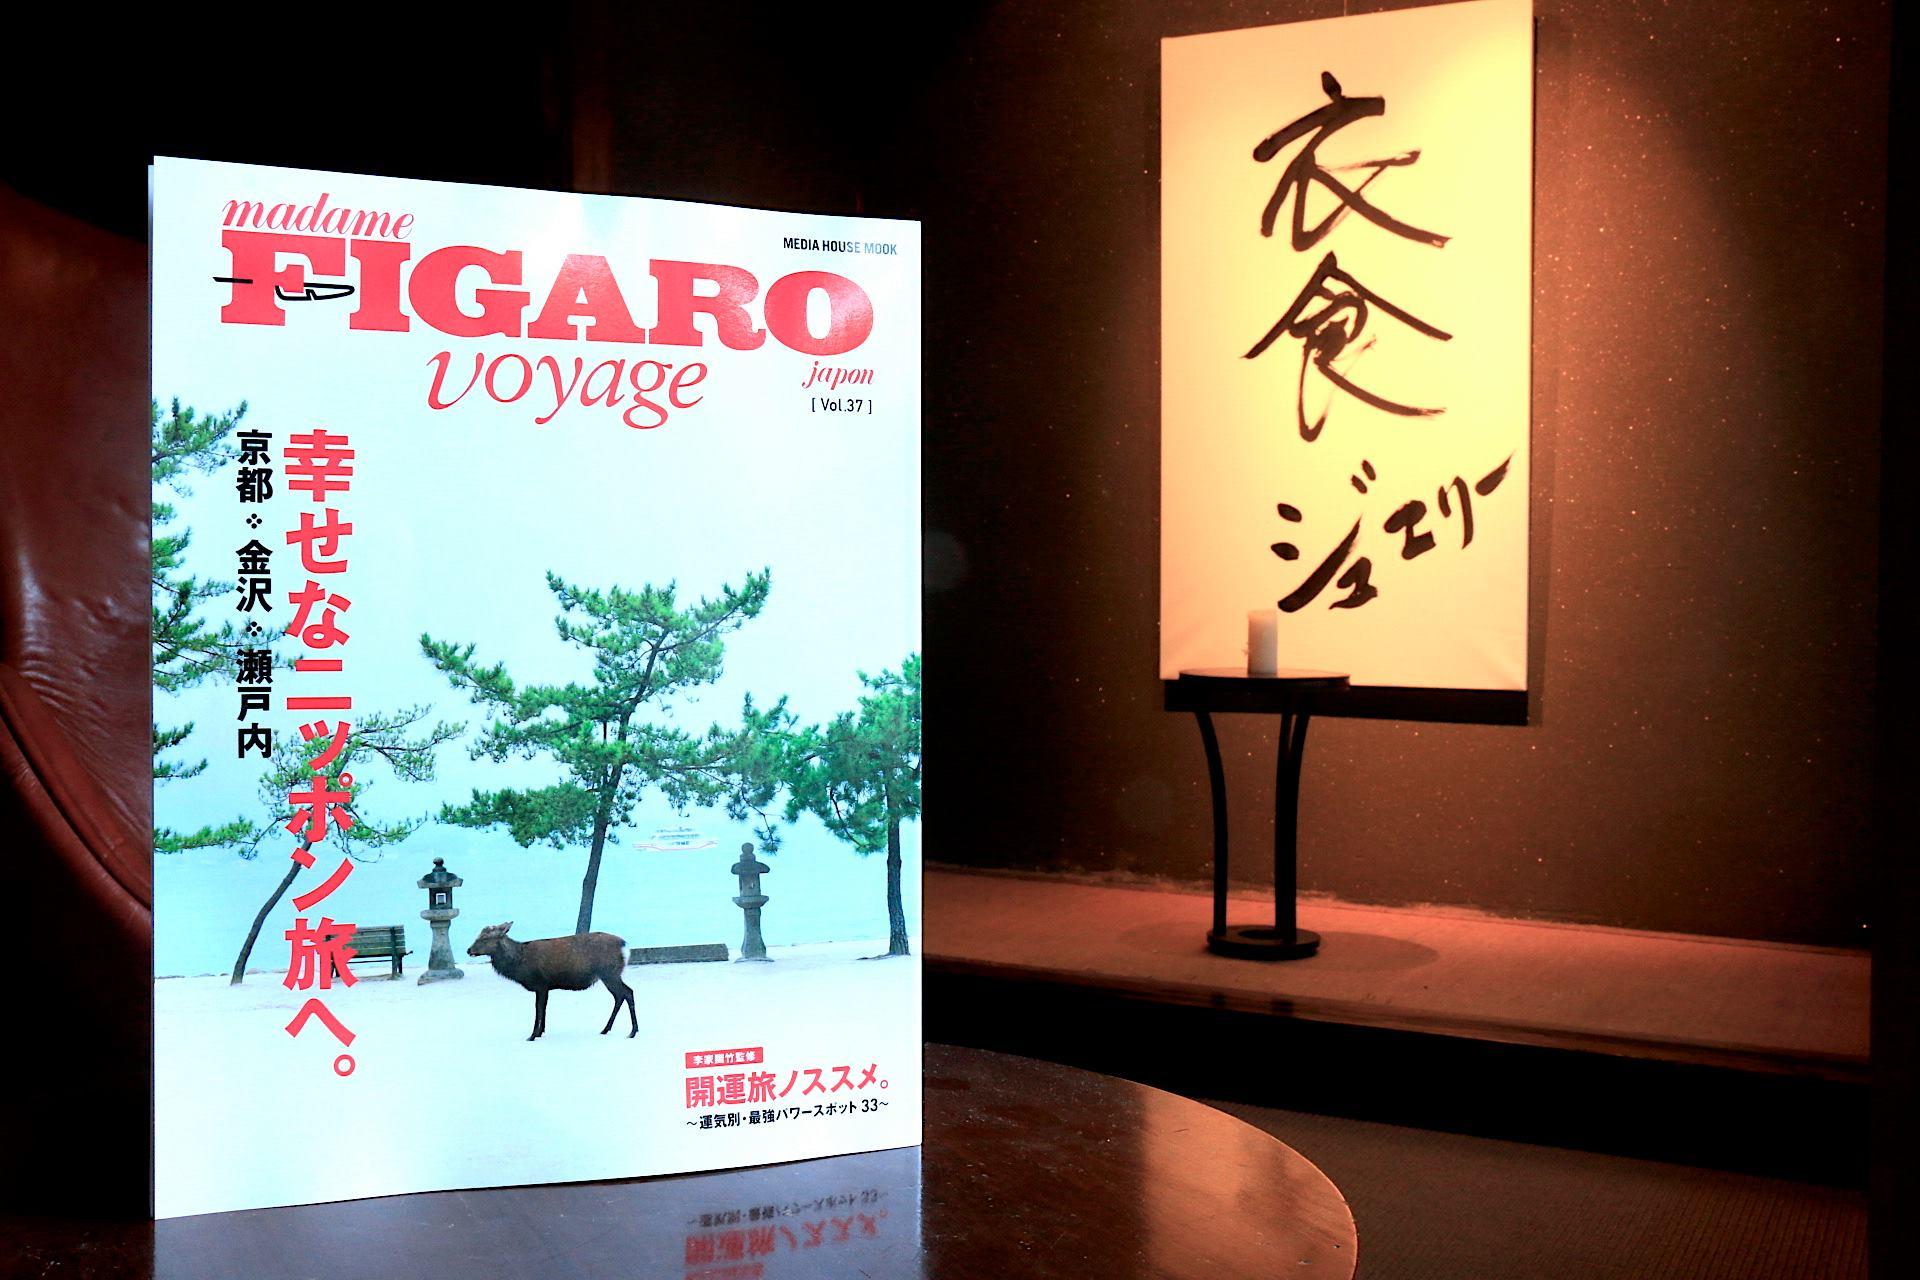 FIGARO japan voyage 掲載のお知らせ